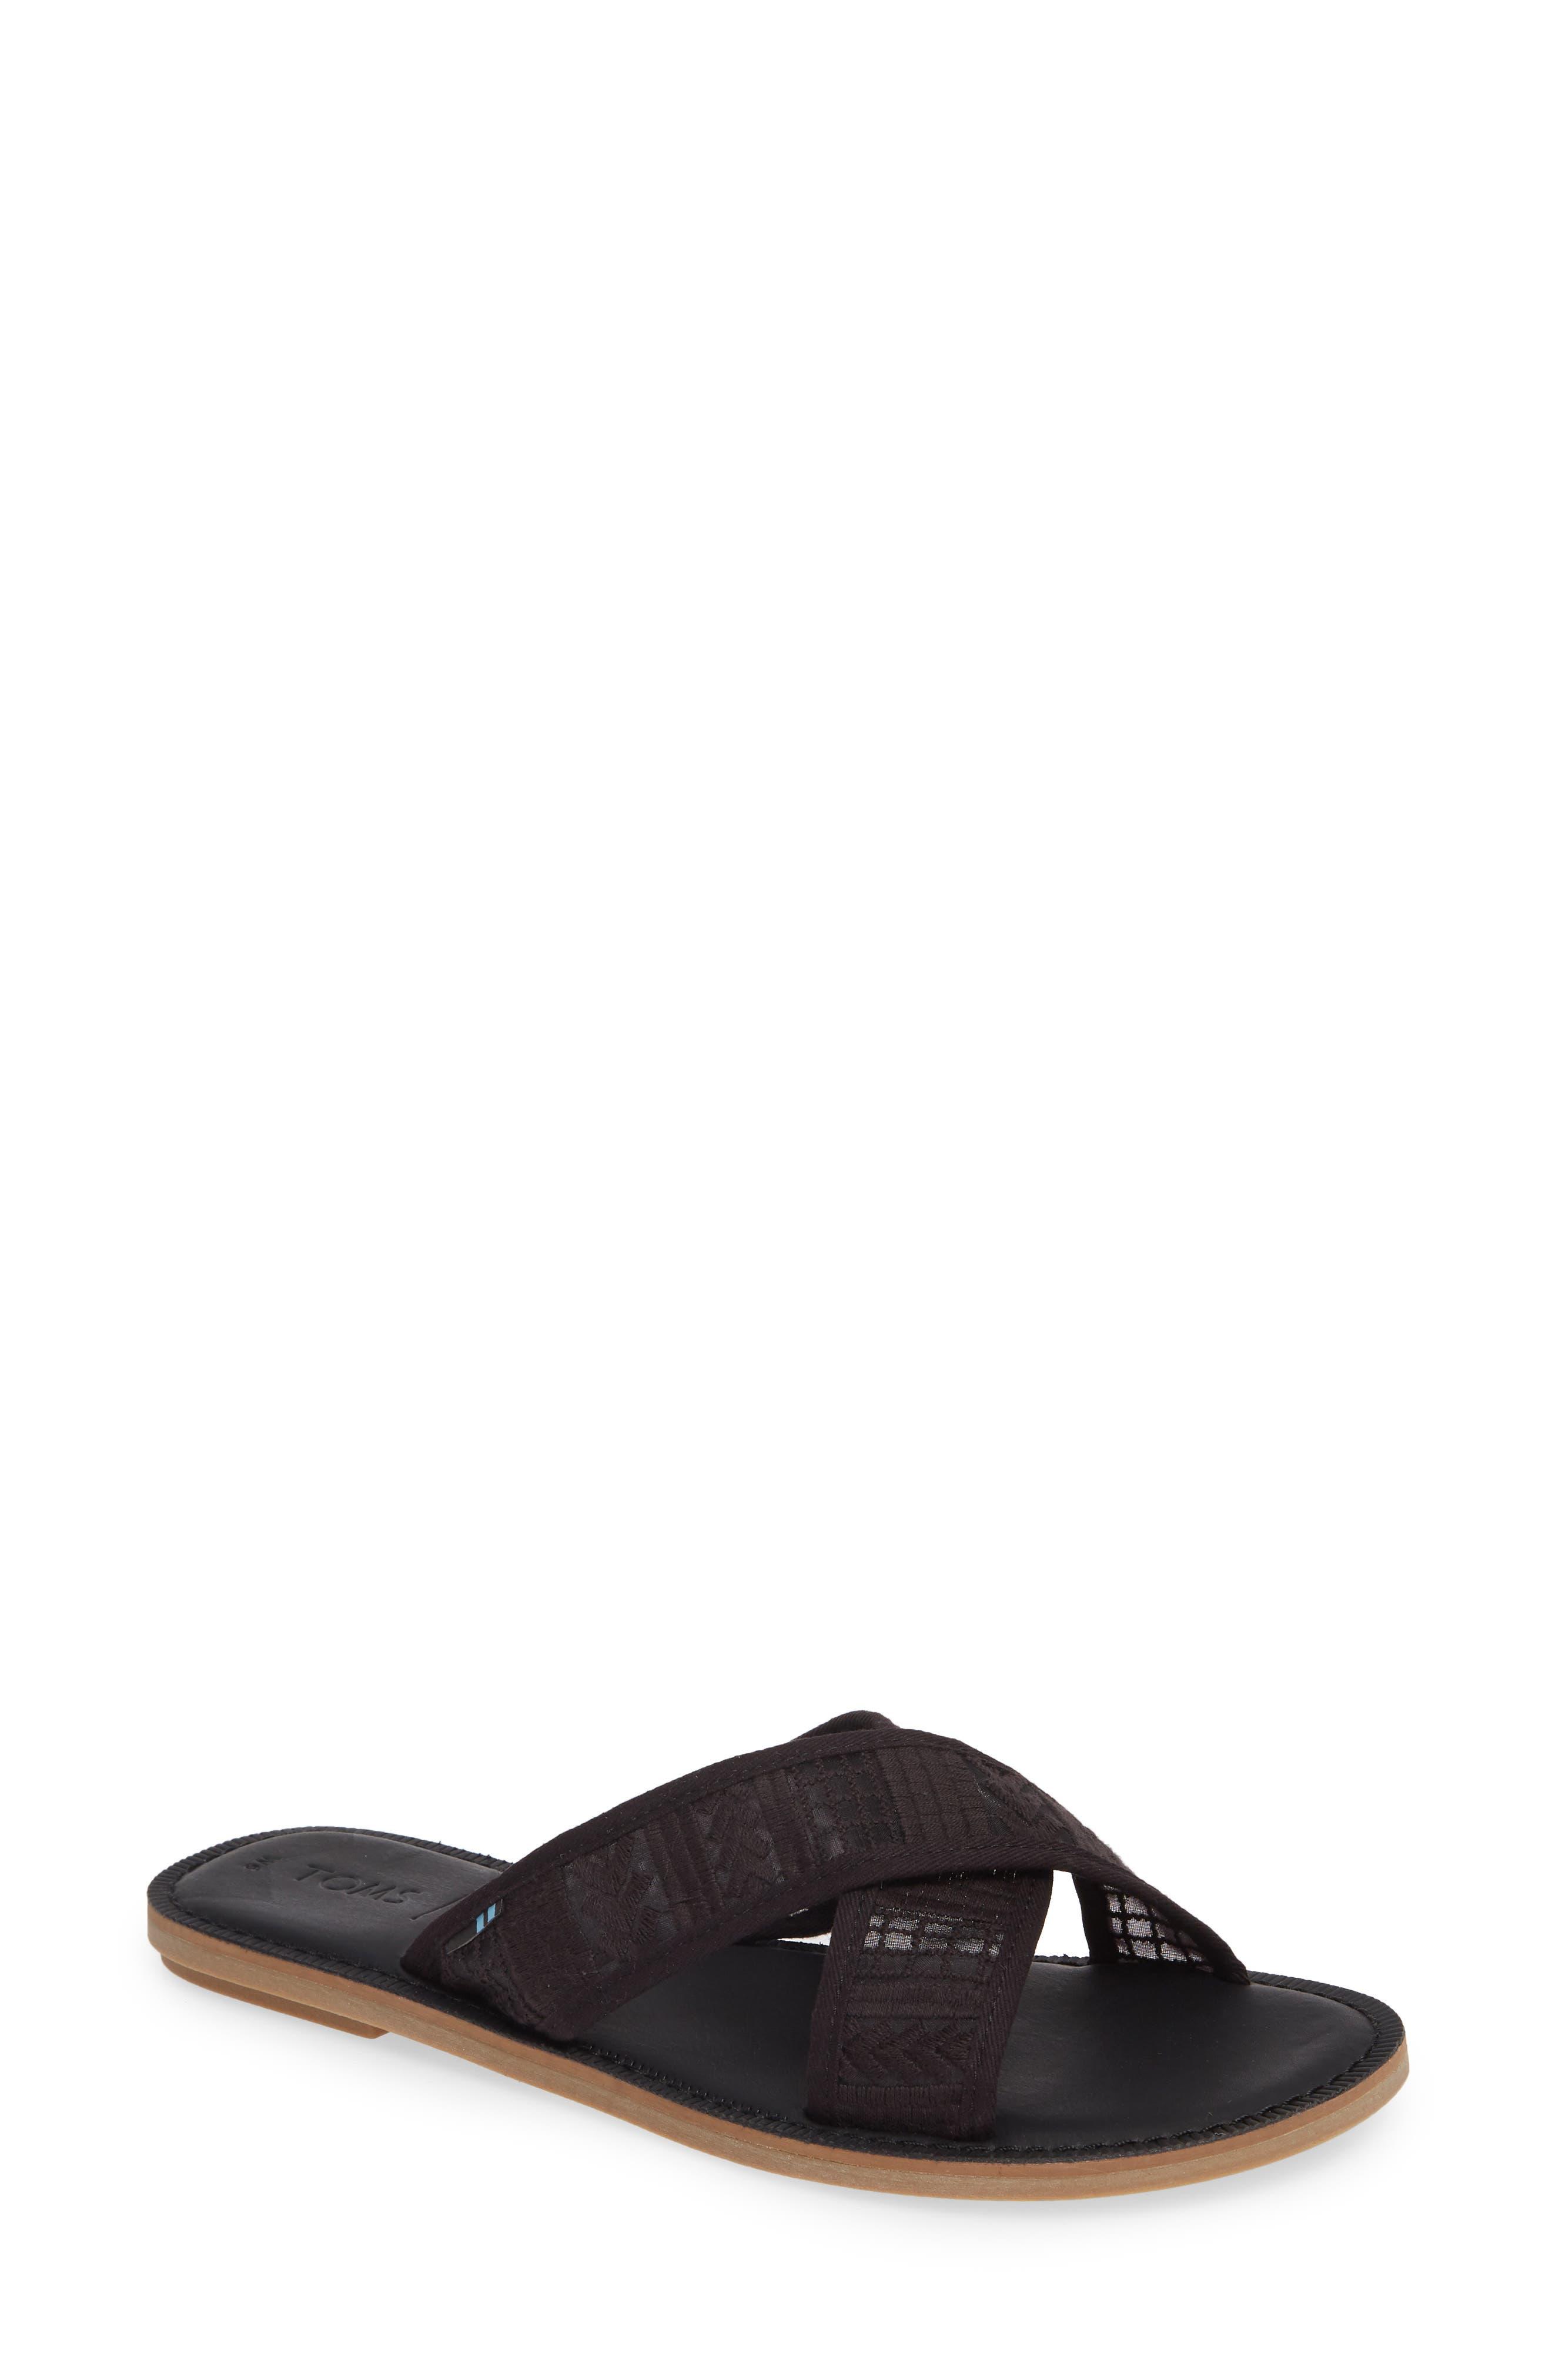 dac0604e1eff1 Women's TOMS Shoes | Nordstrom